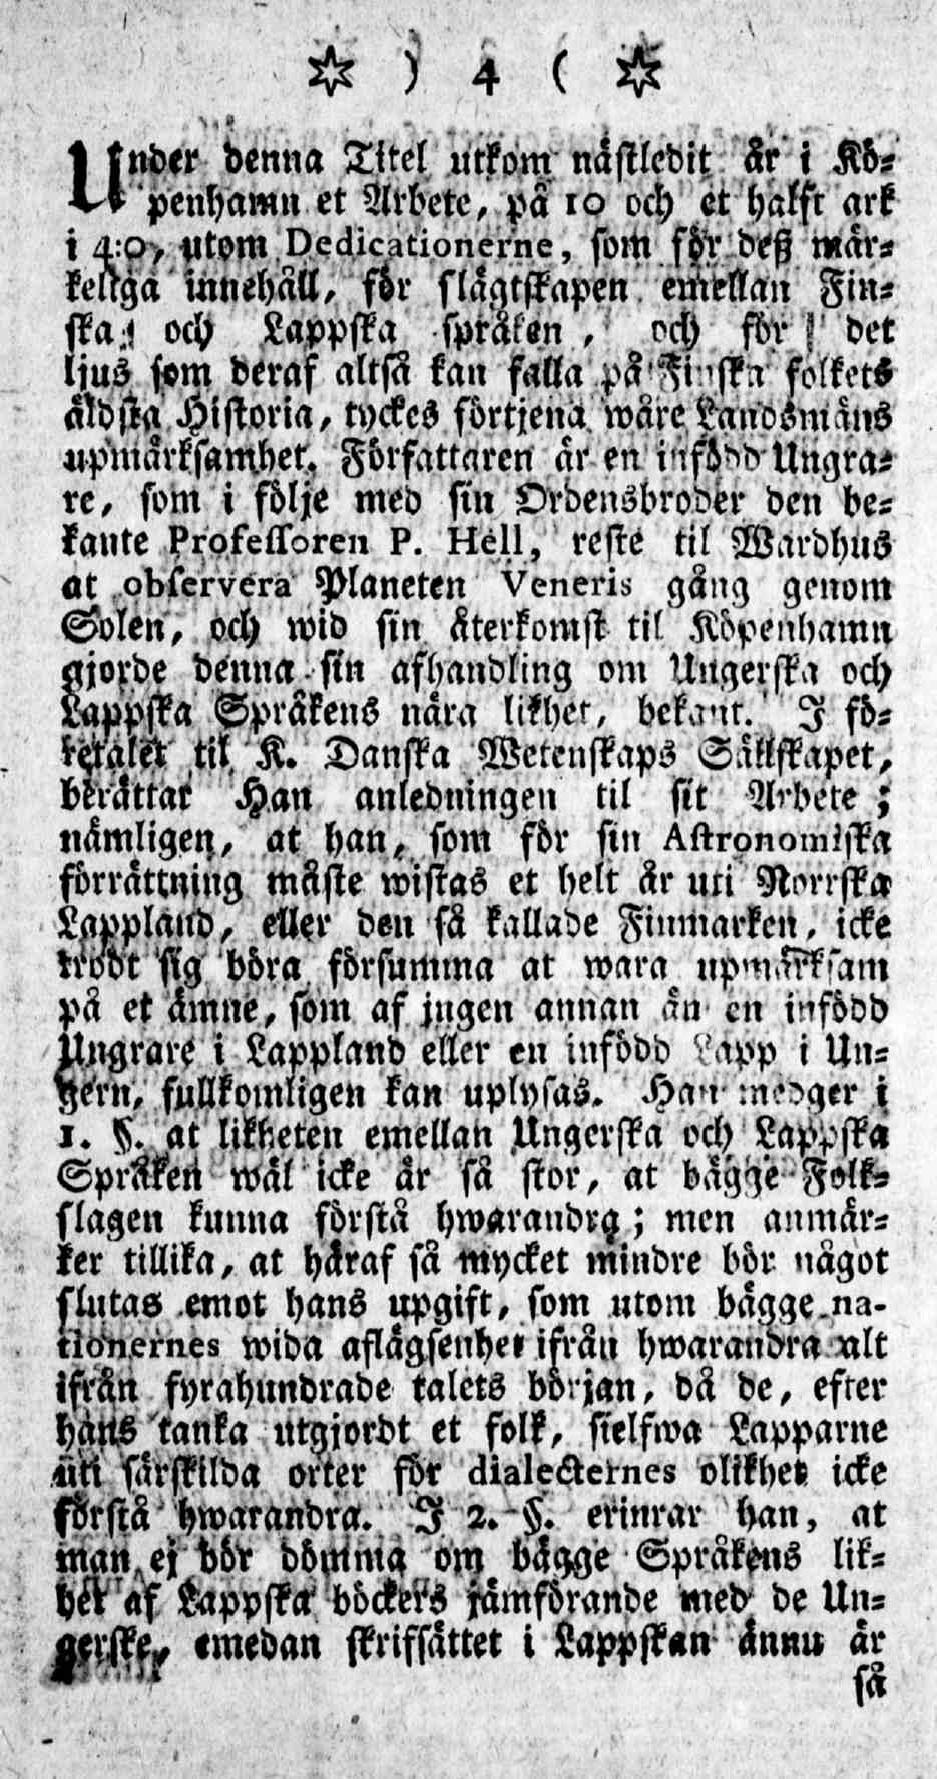 Tidningar Utgifne af et Sällskap i Åbo, 15.01.1771, nro 1, sivu 4